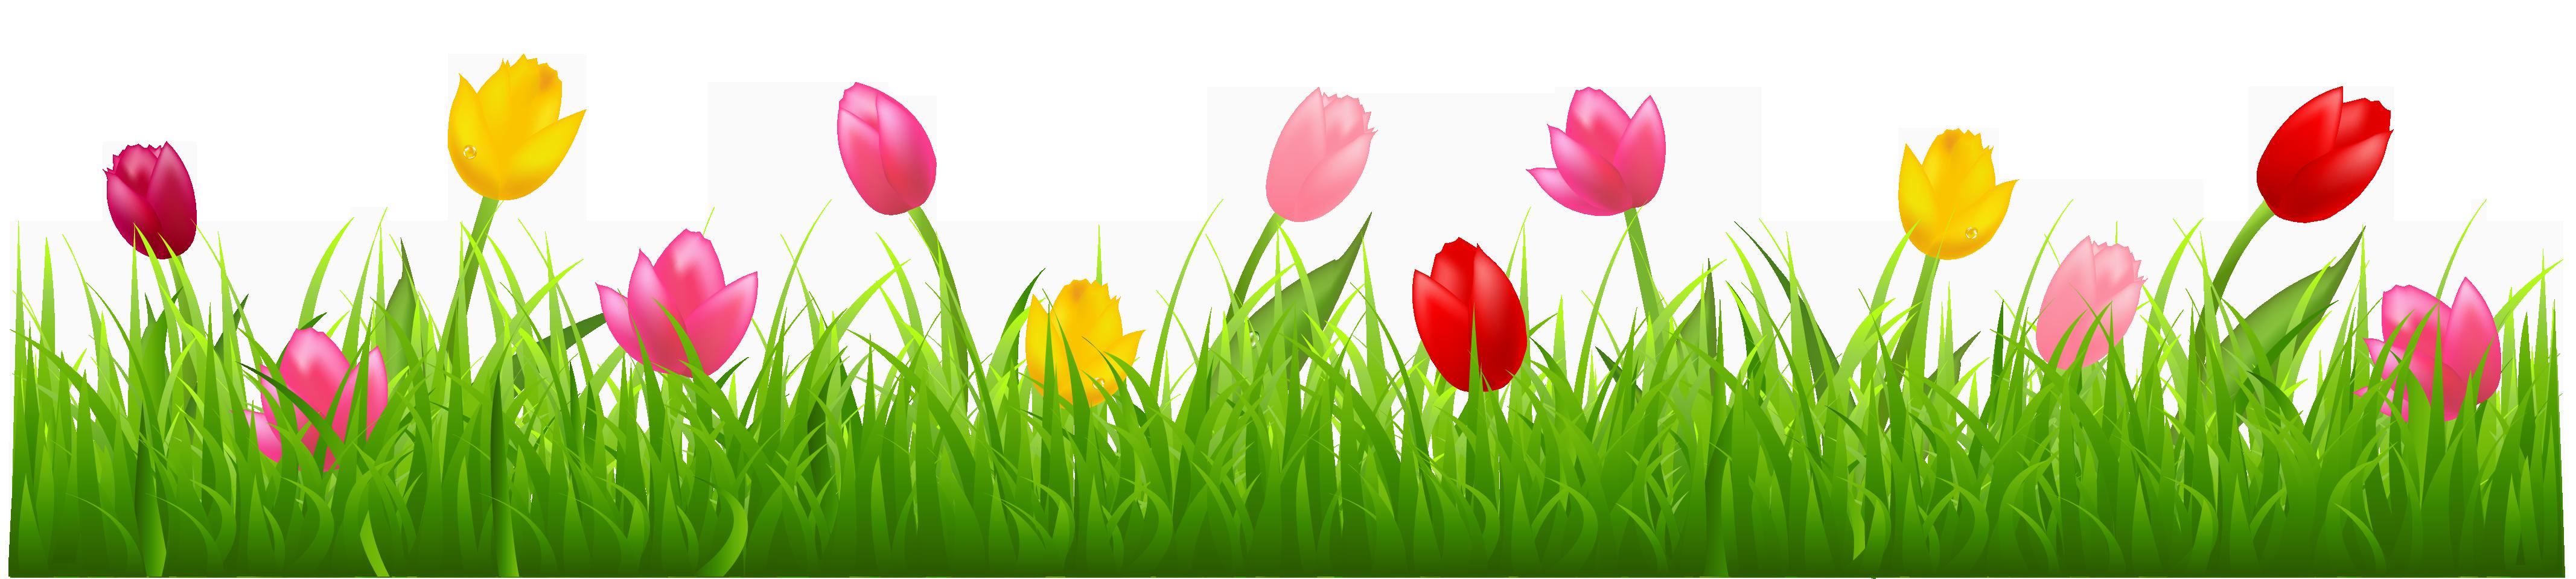 Free clip art grass clipart image 3